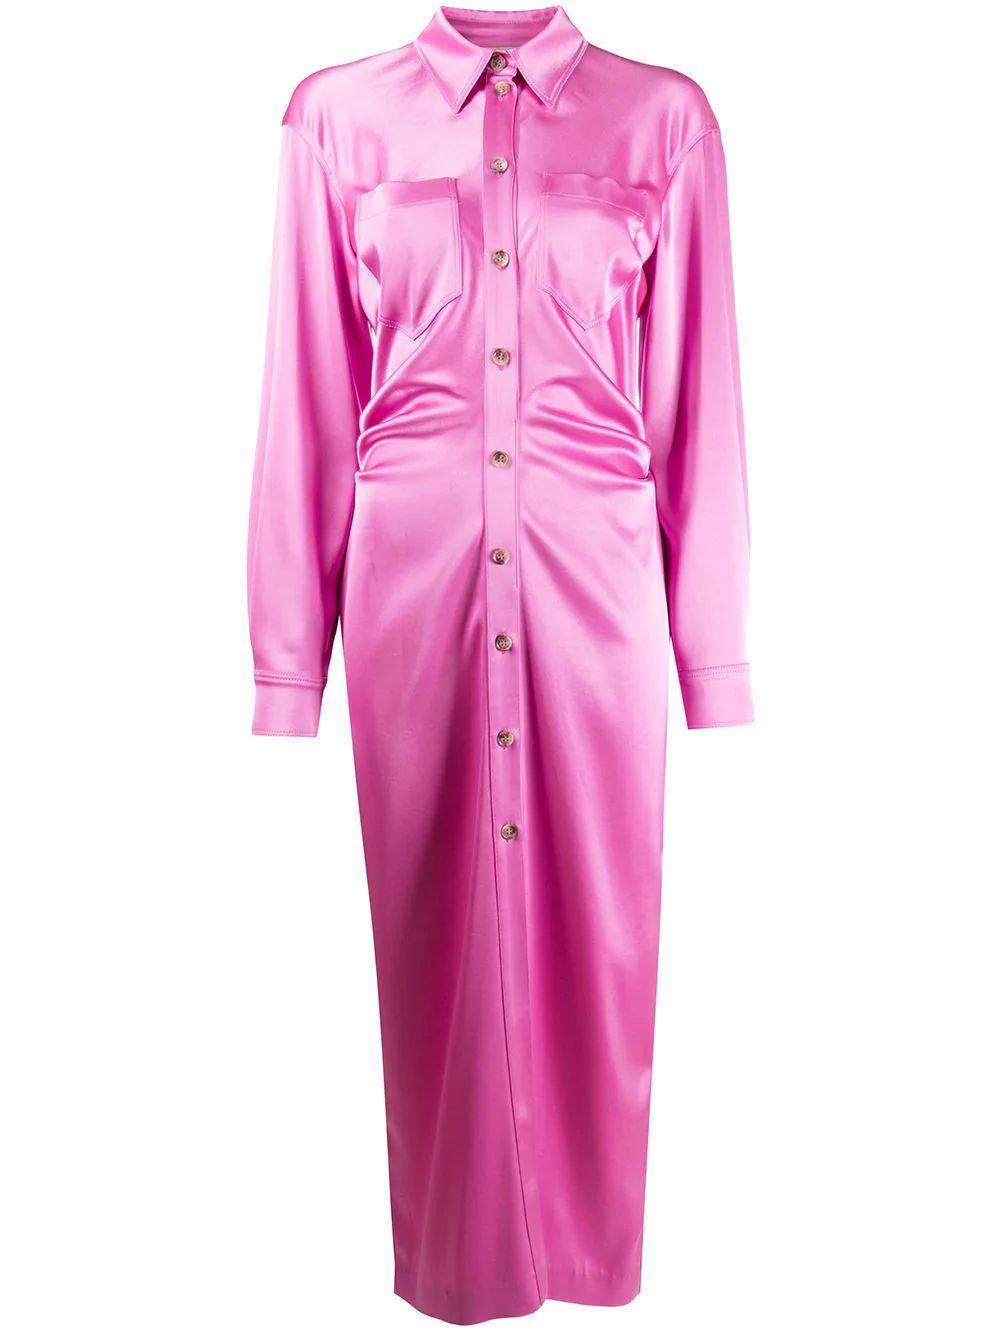 Kinsley Shirtdress Item # FWDR05234